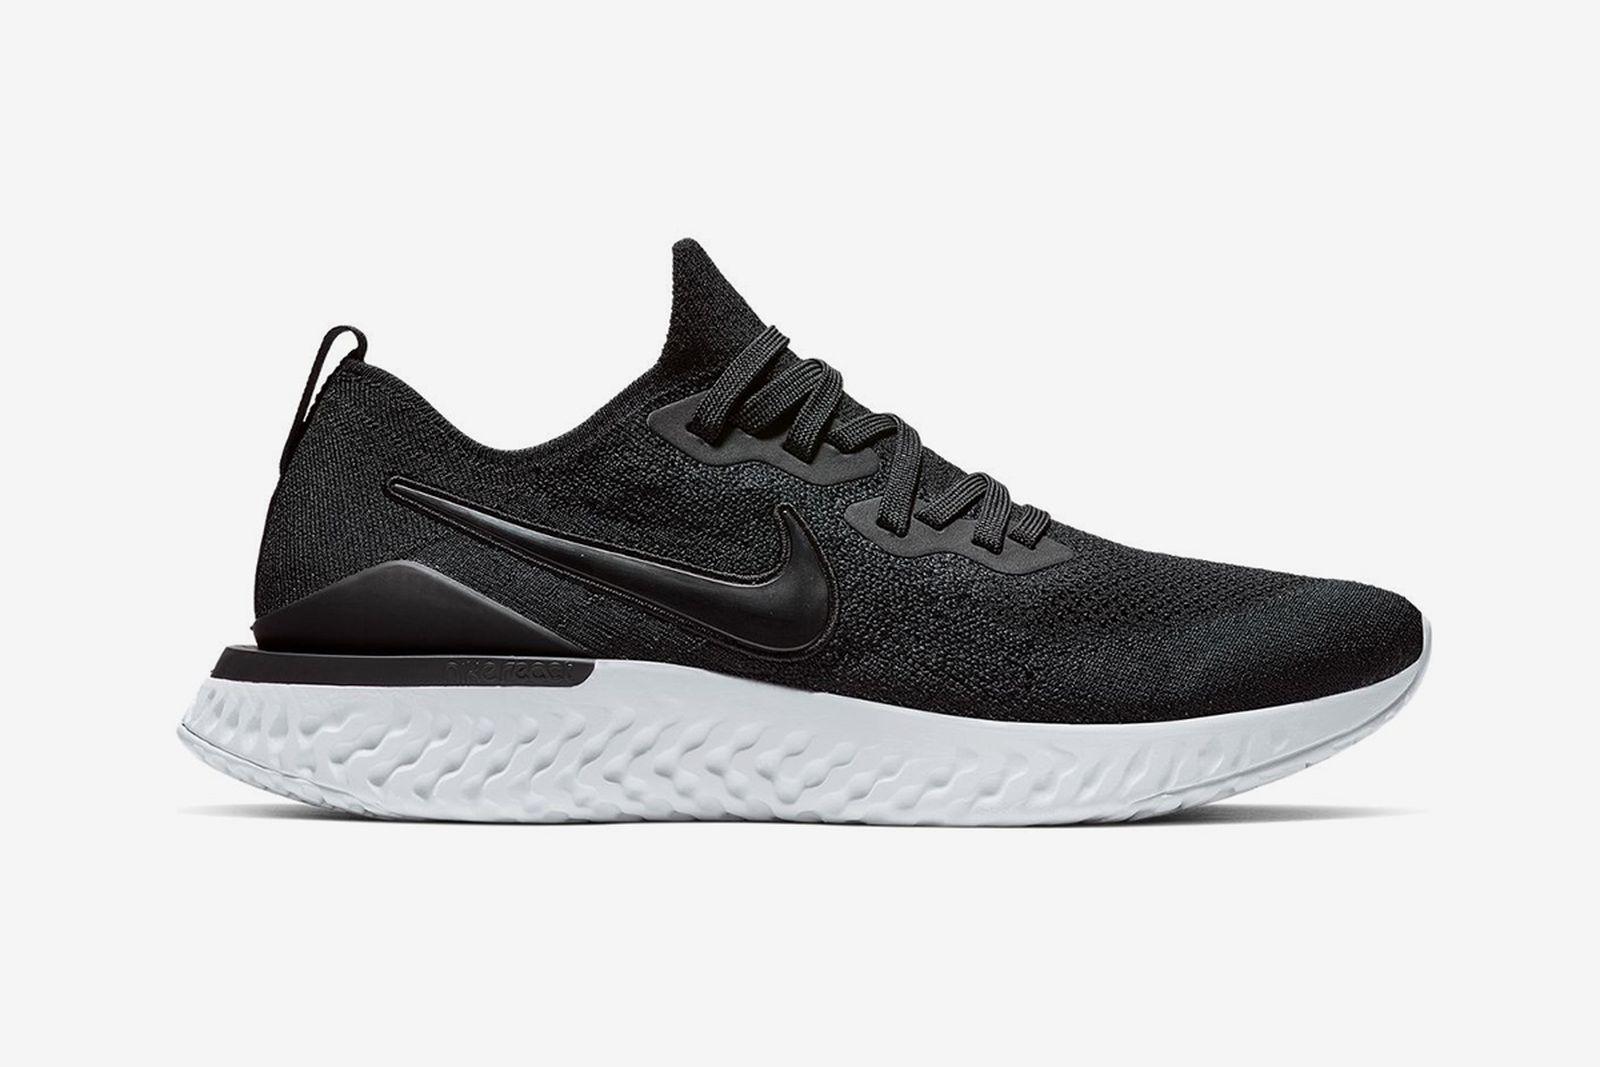 best-running-shoes-for-men-guide-salomon-nike-epic-flyknit-react